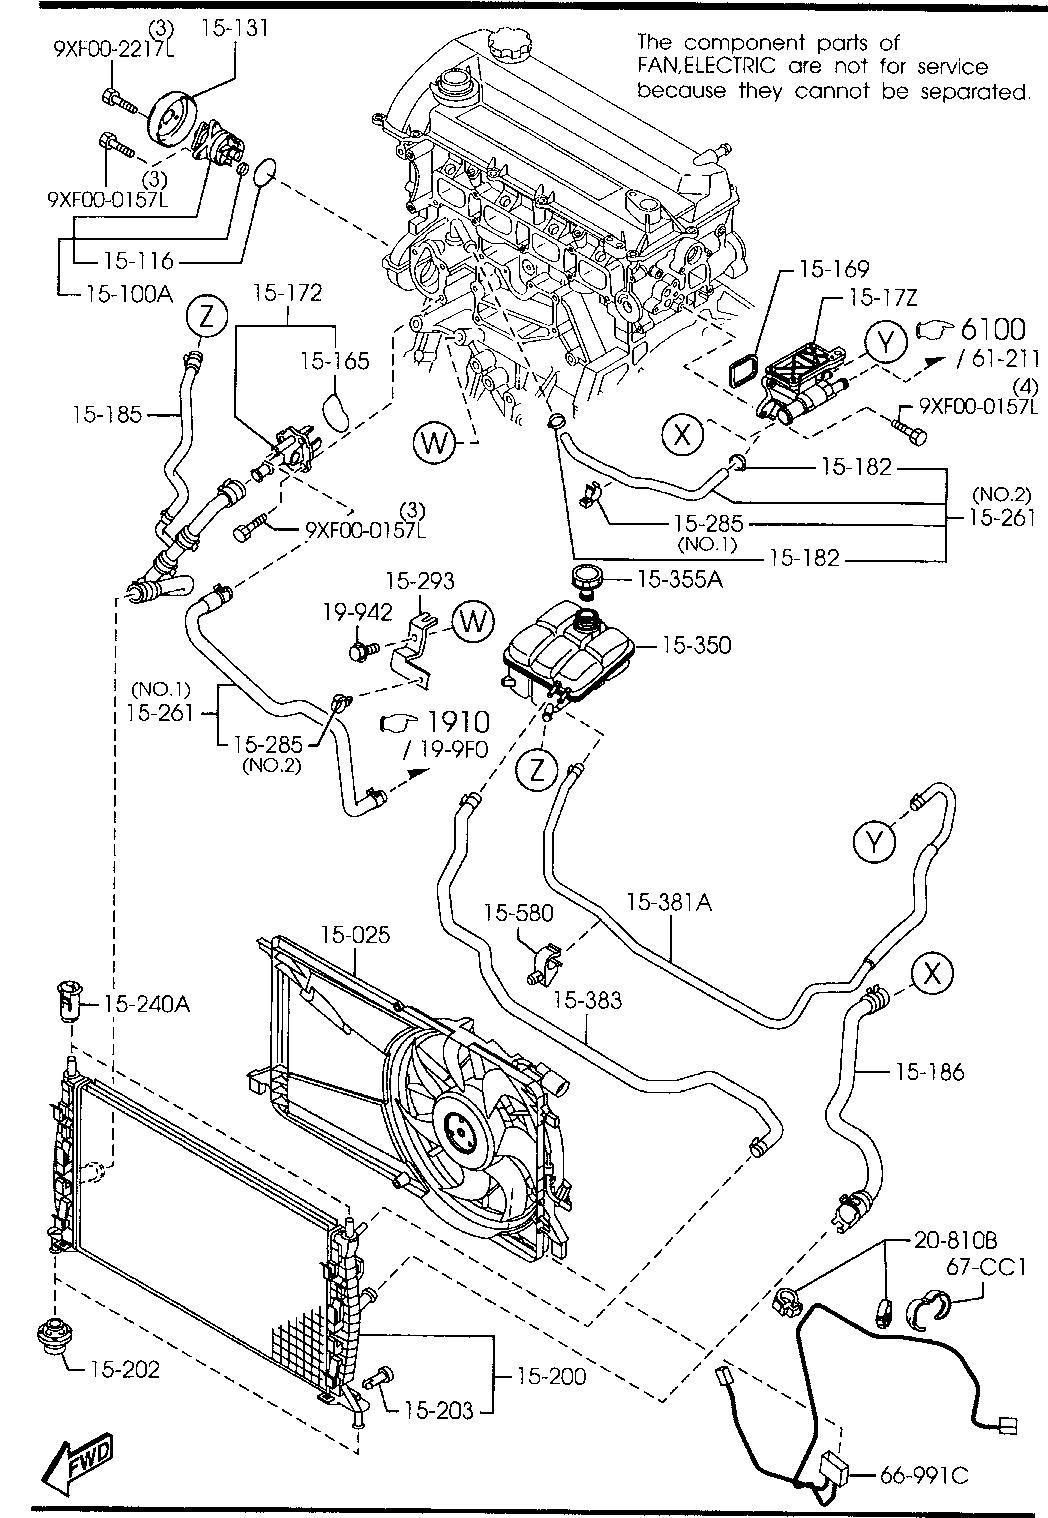 Mazda 3 Engine Diagram - Air Ride Switch Box Wiring Diagram -  2005ram.tukune.jeanjaures37.frWiring Diagram Resource